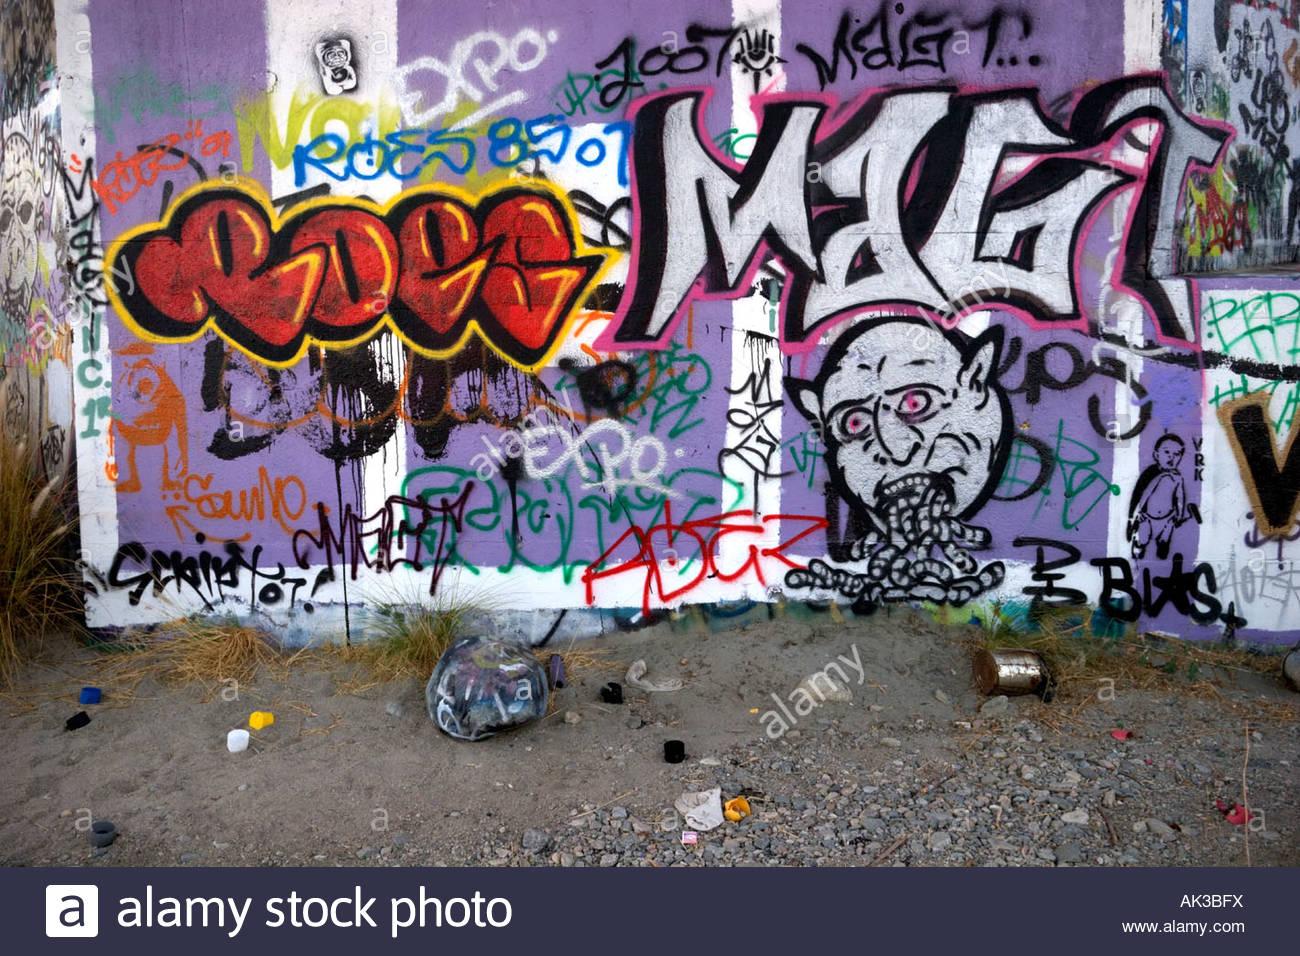 Graffiti Spray Paint Instructions